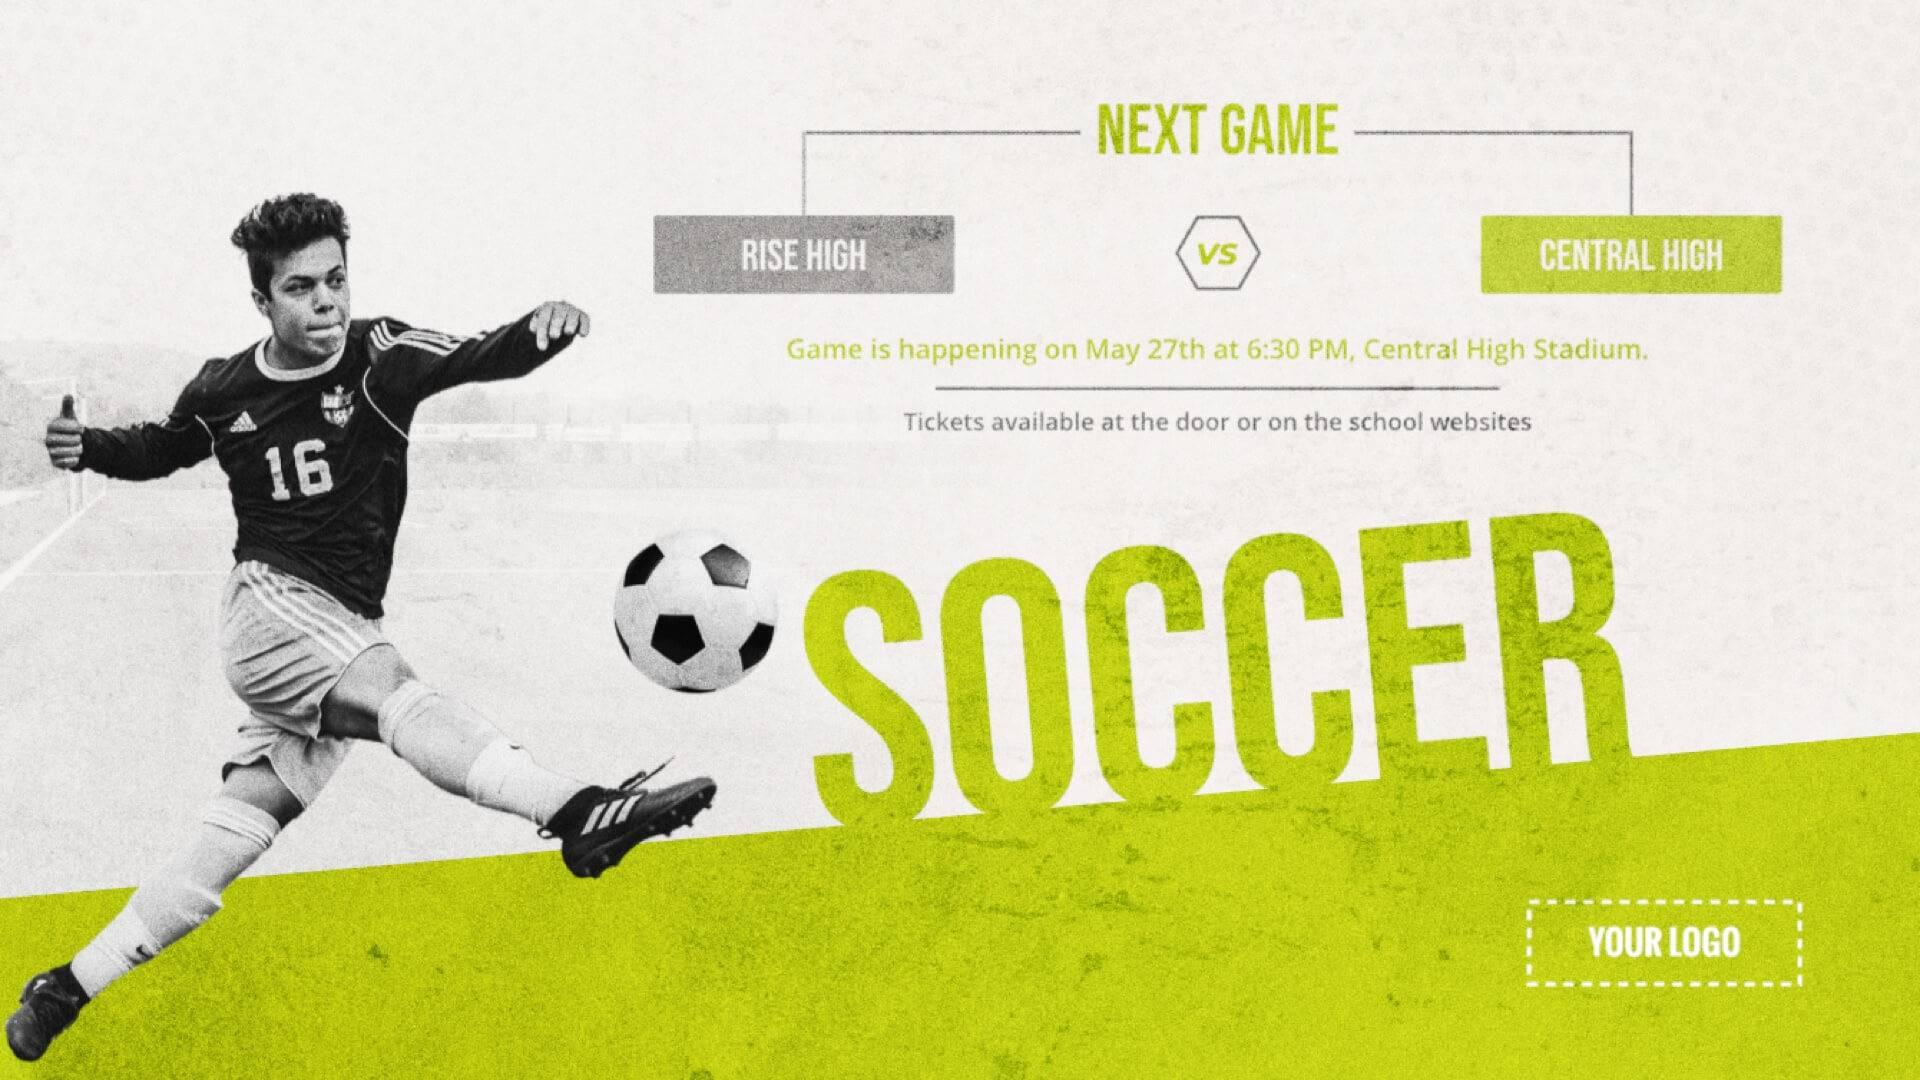 Soccer Game - Sports Digital Signage Template